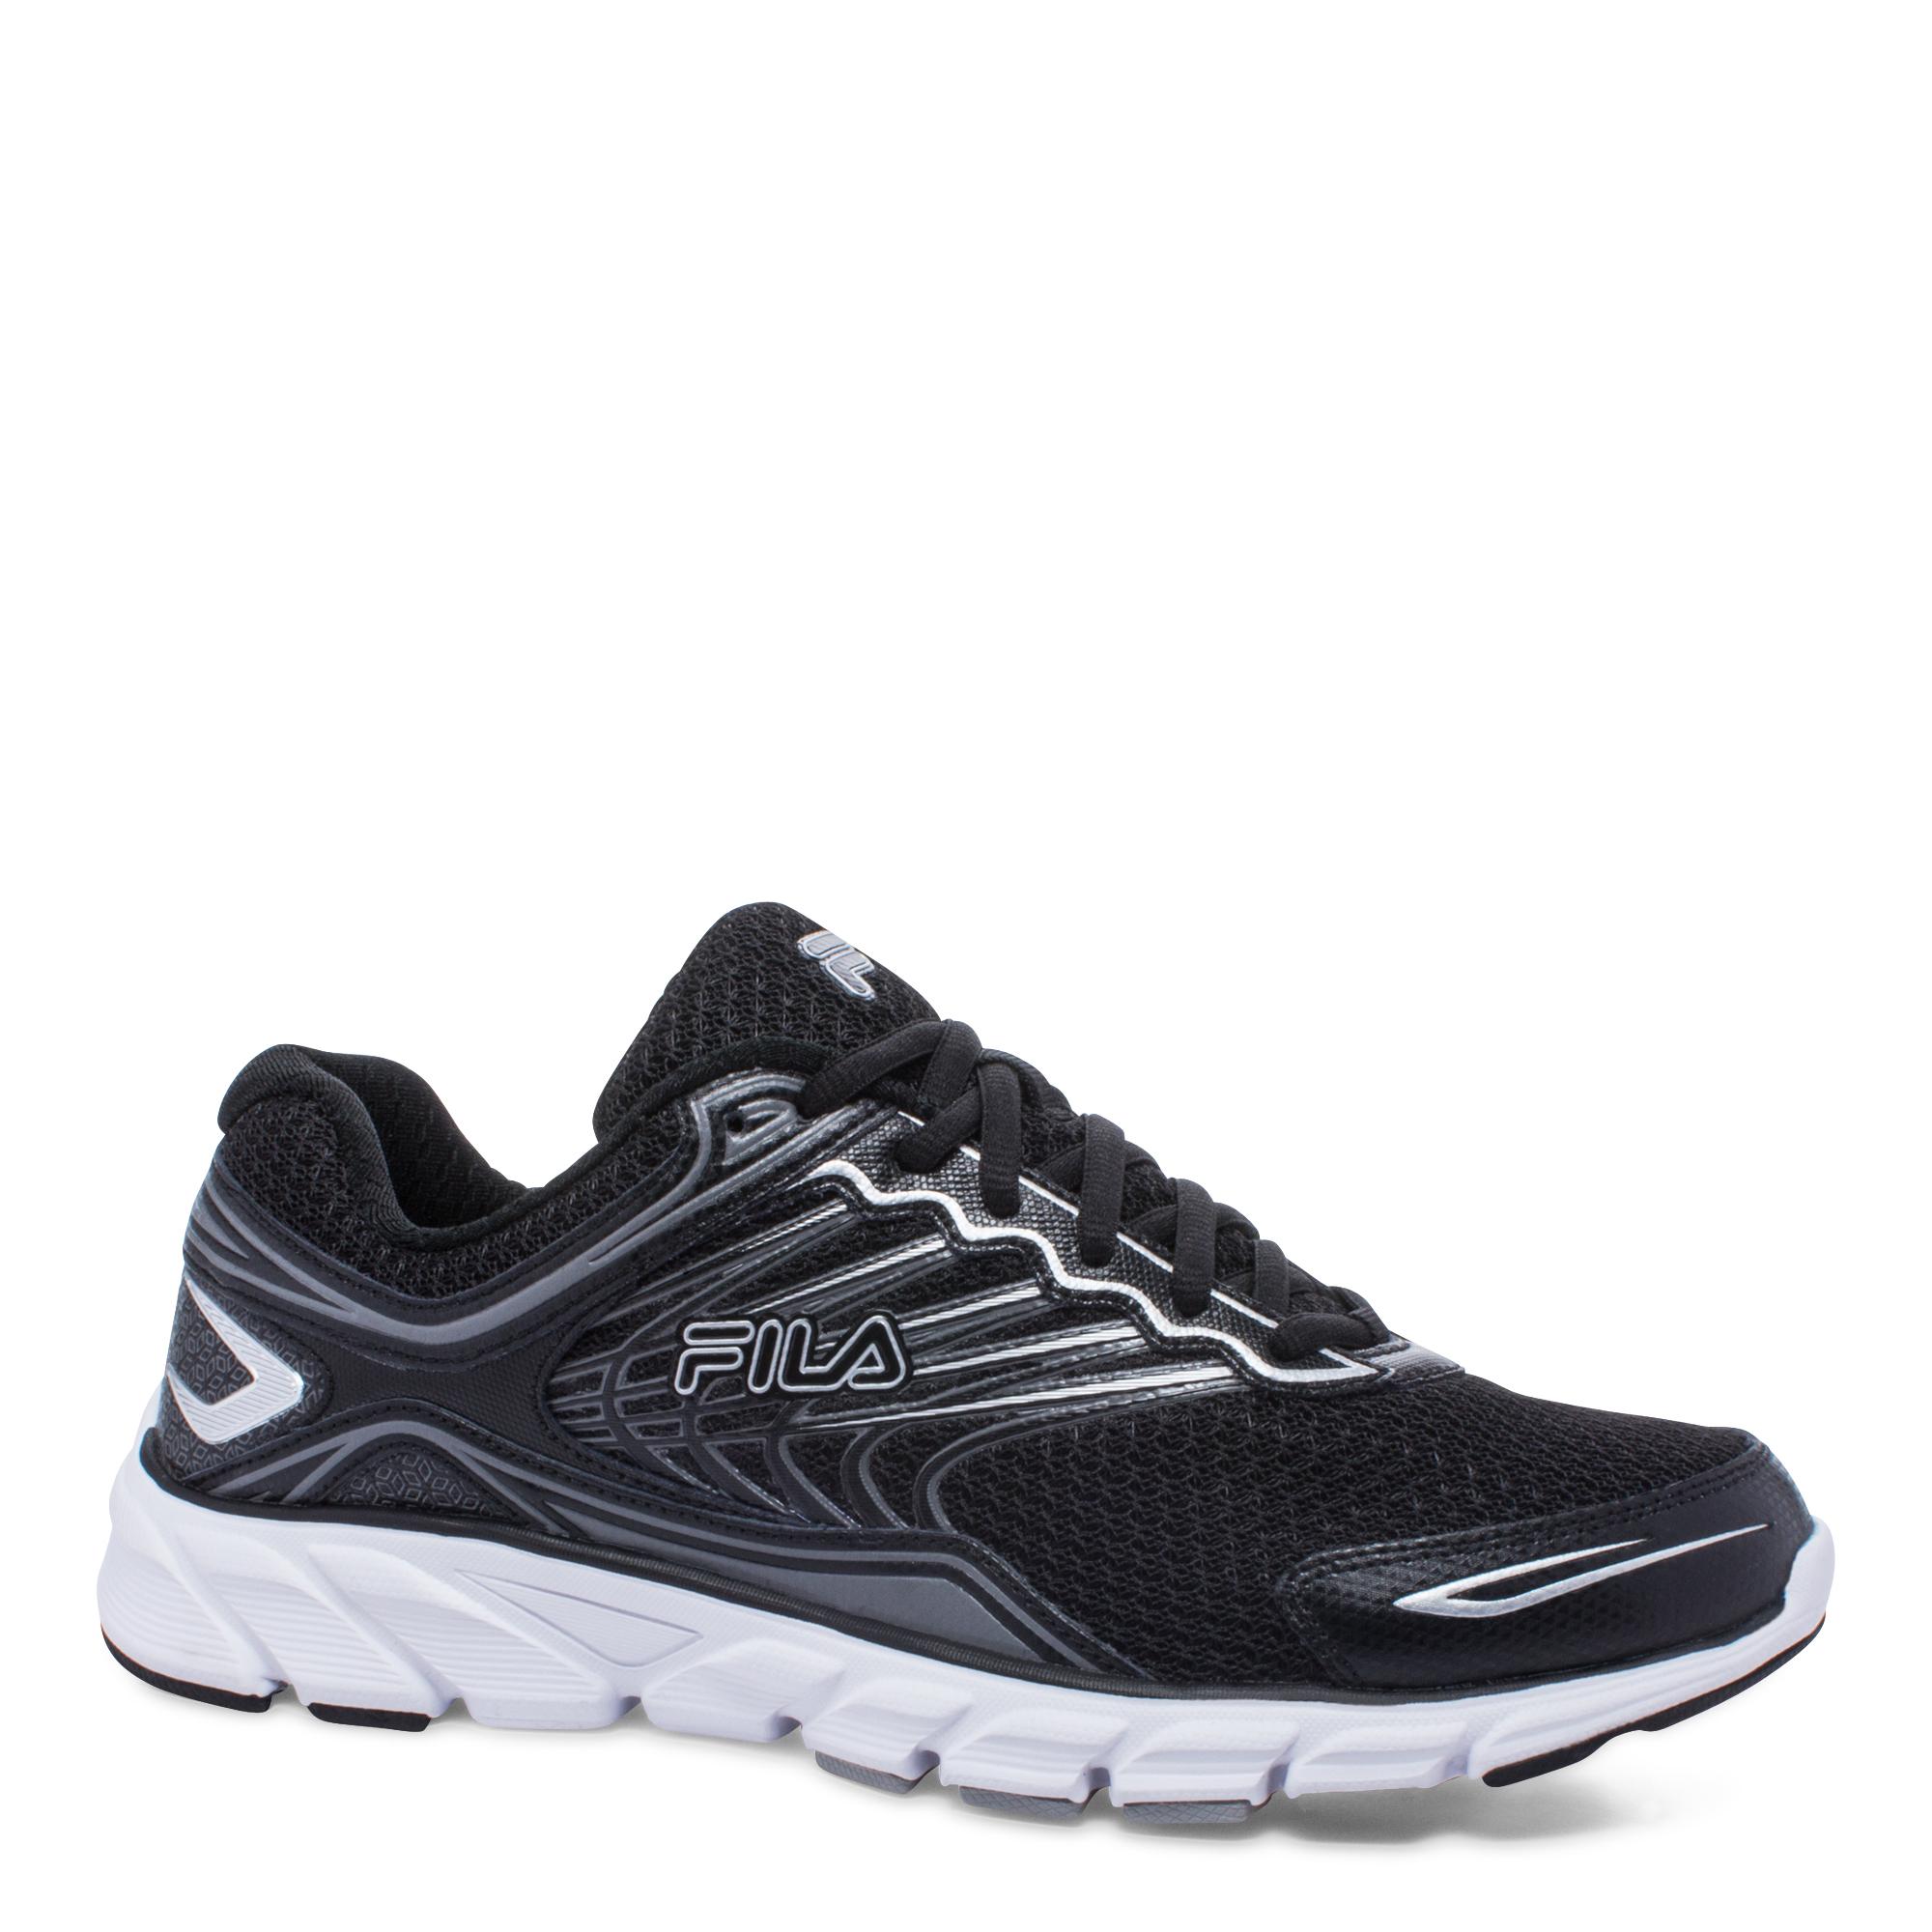 Fila Men\u0027s Memory Maranello 4 Running Shoe